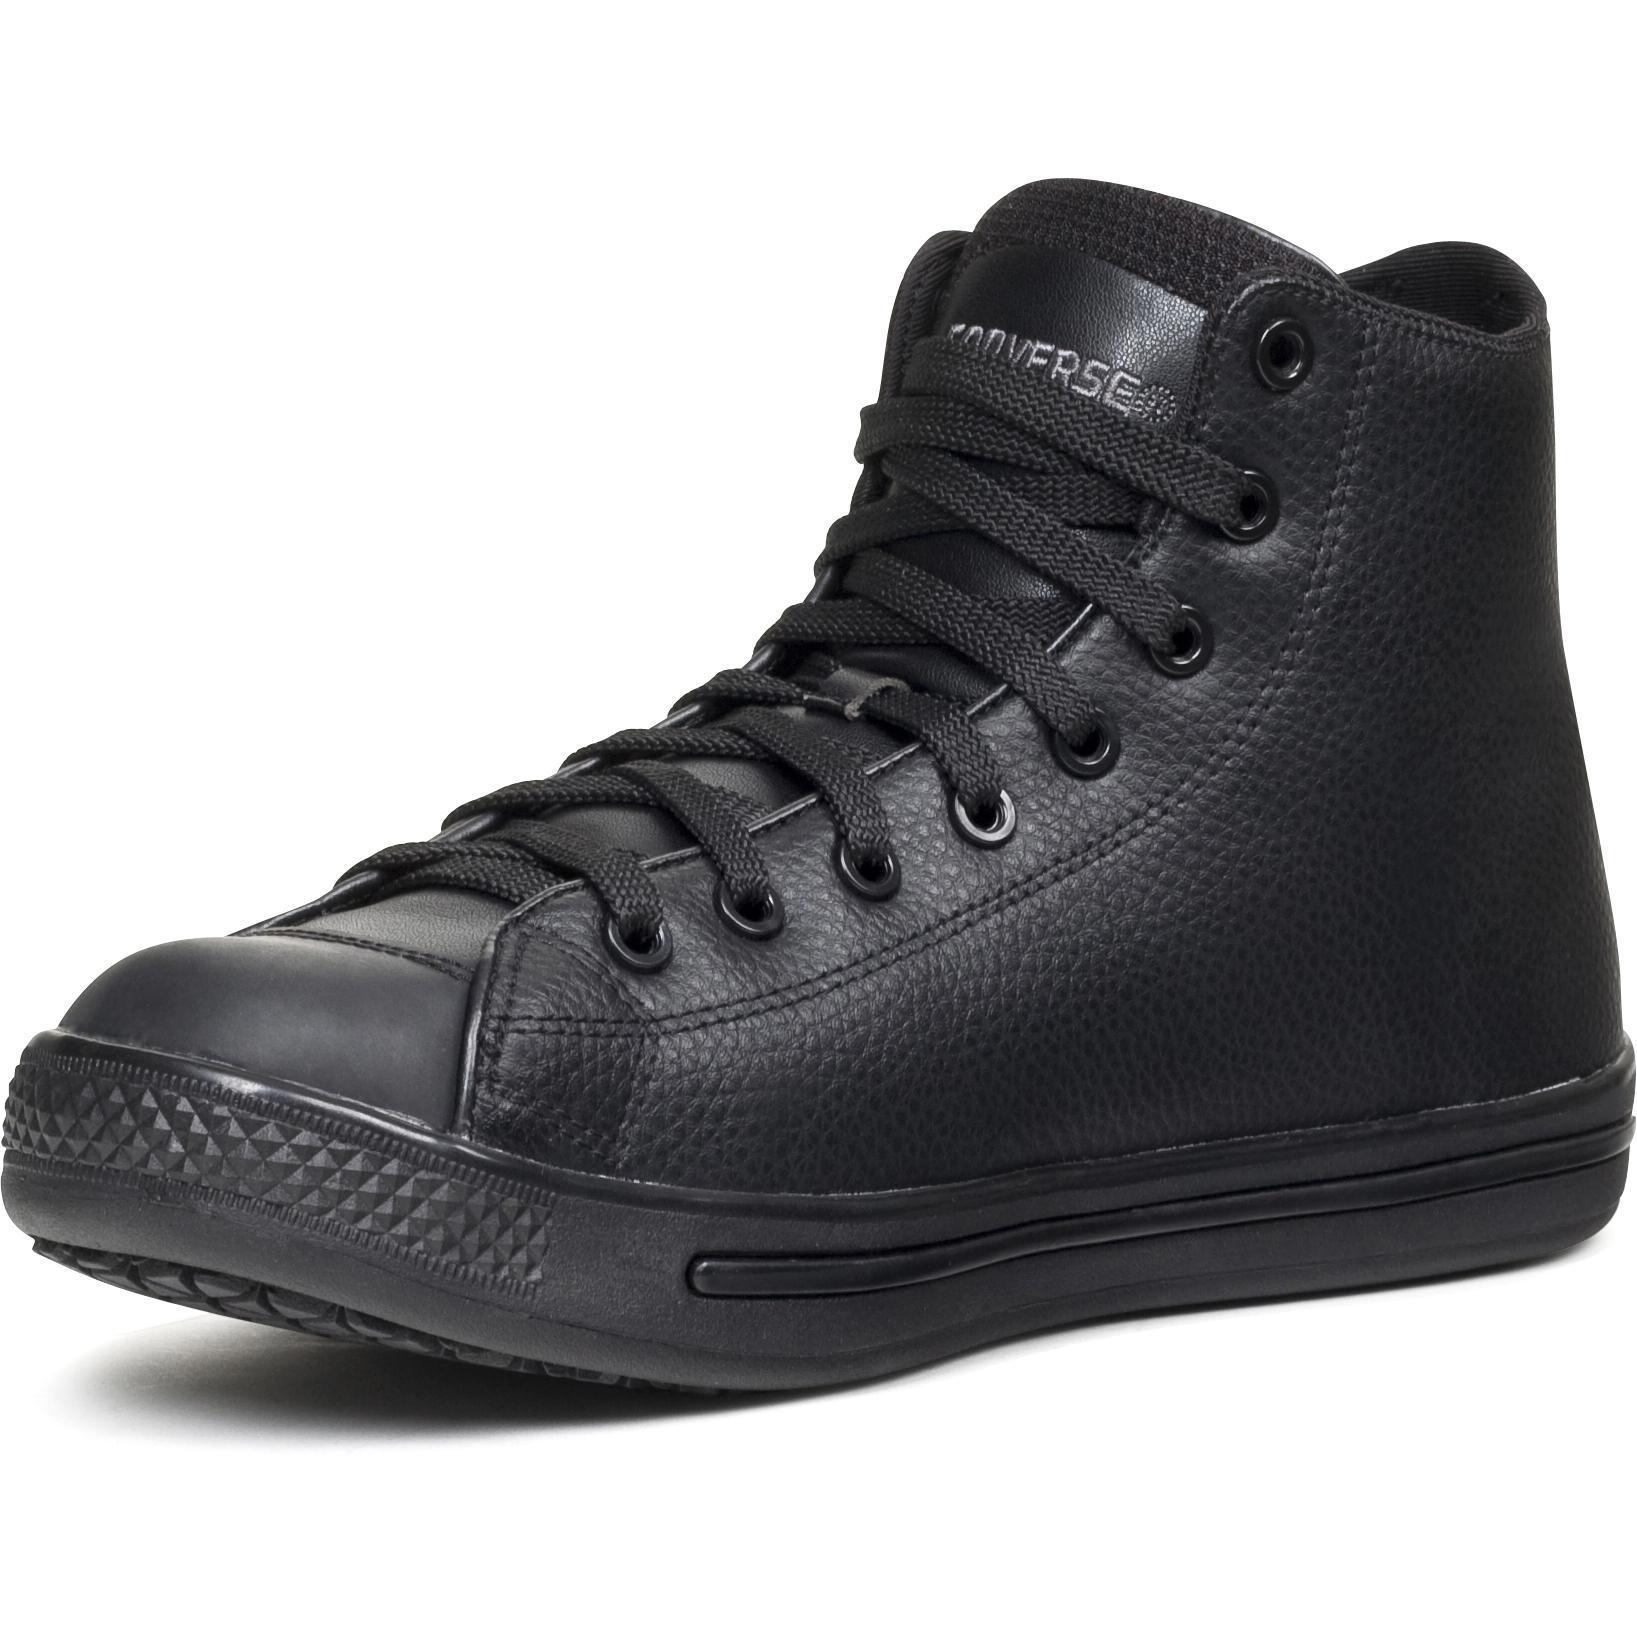 non slip work shoes for kitchen small kitchens ideas converse style guru fashion glitz